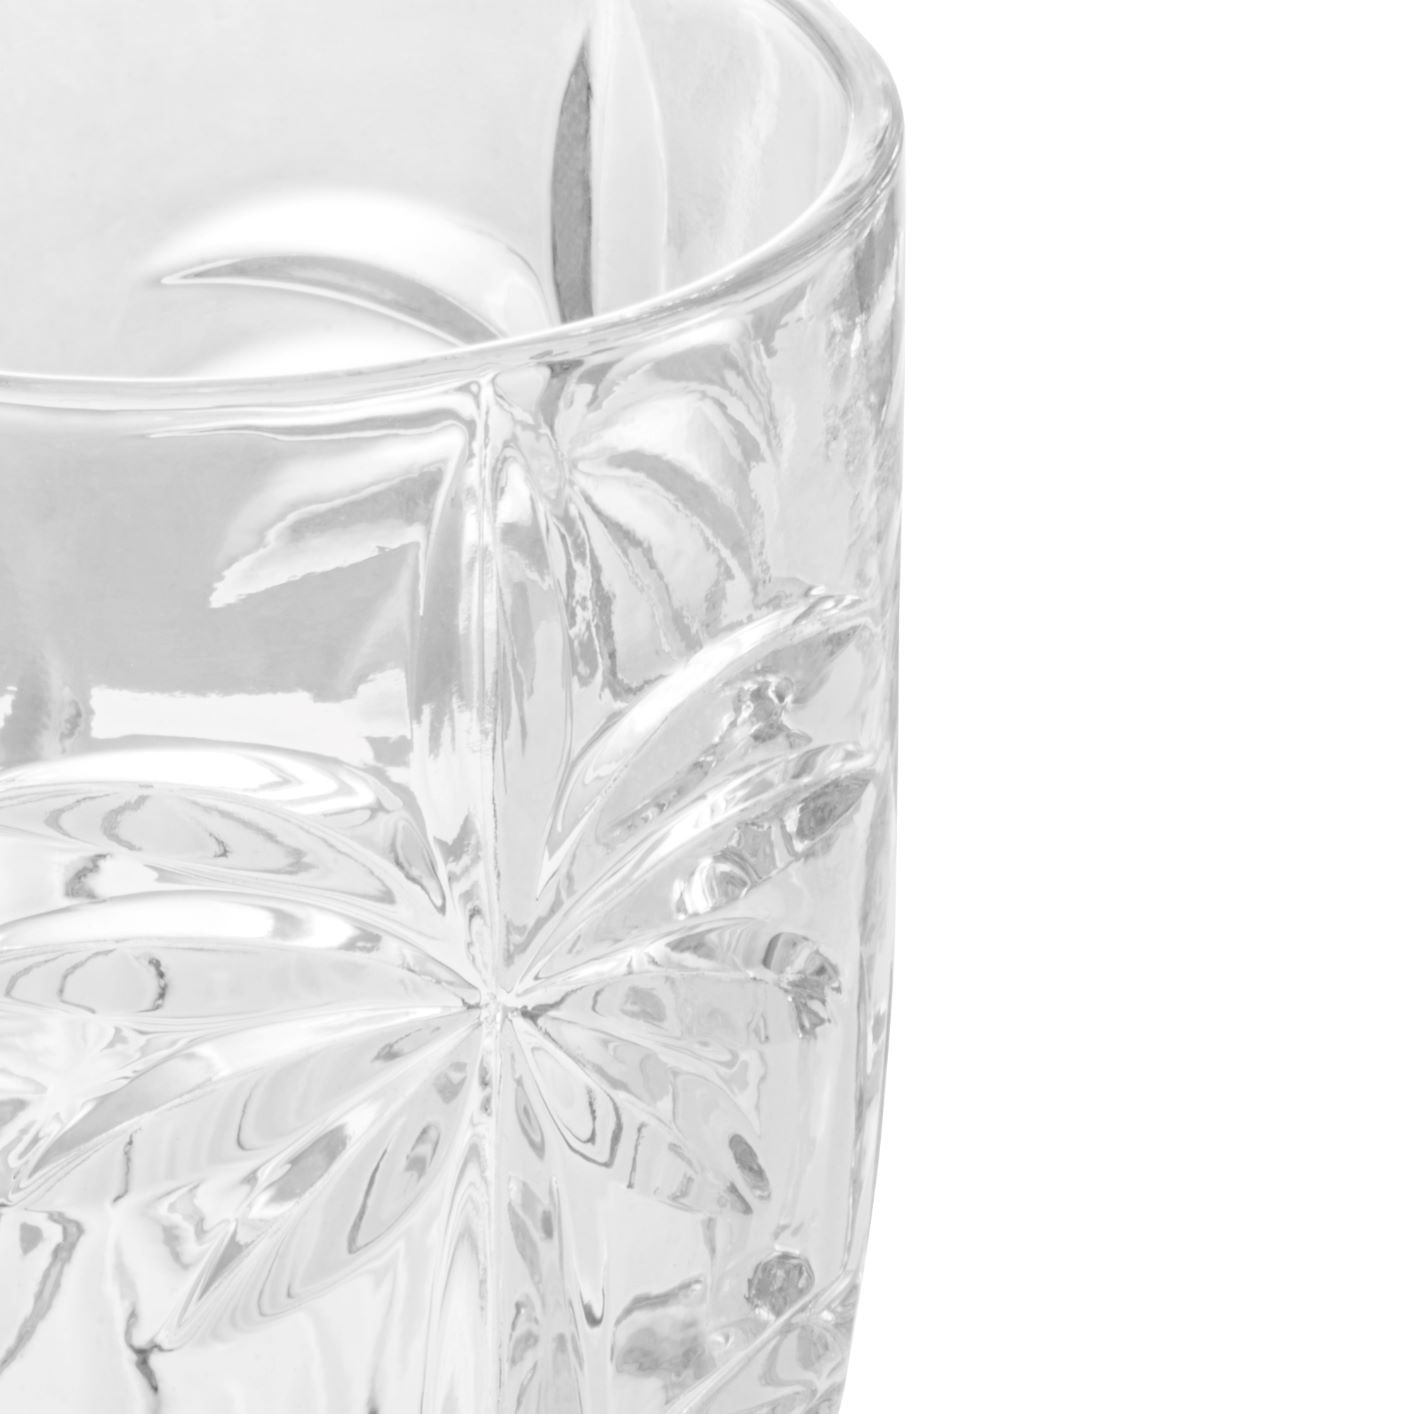 Jogo de Taças de Cristal Wolff - Palm Tree Incolor (6 Peças)